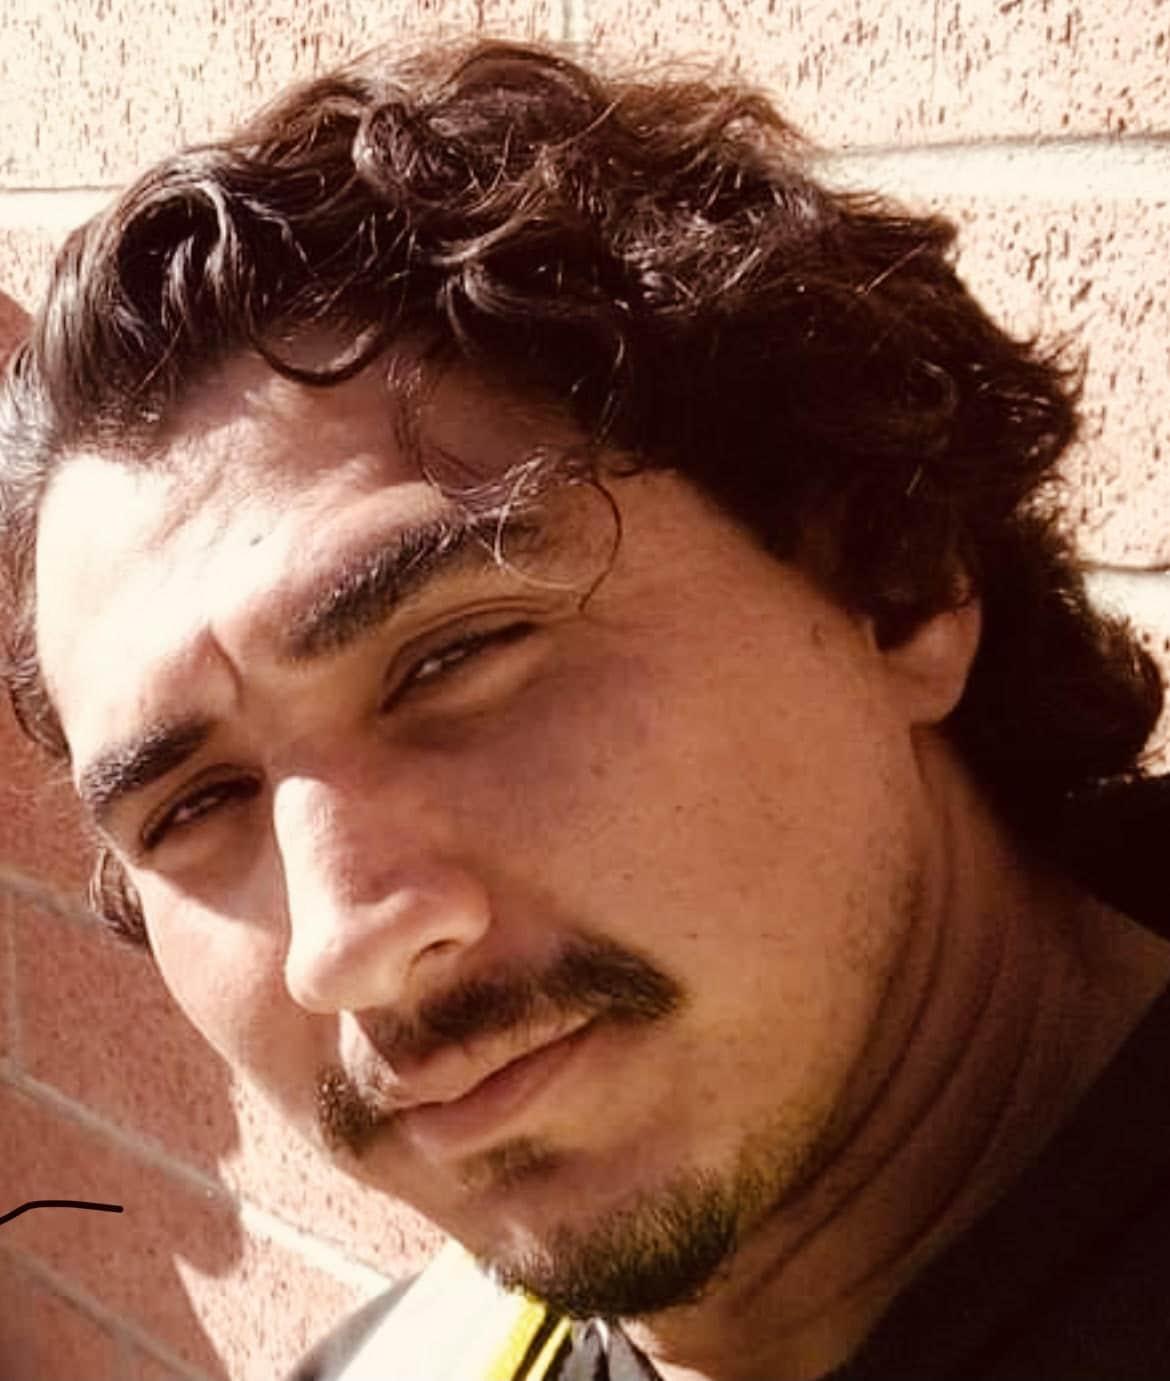 Sergio Salazar Obit Pic